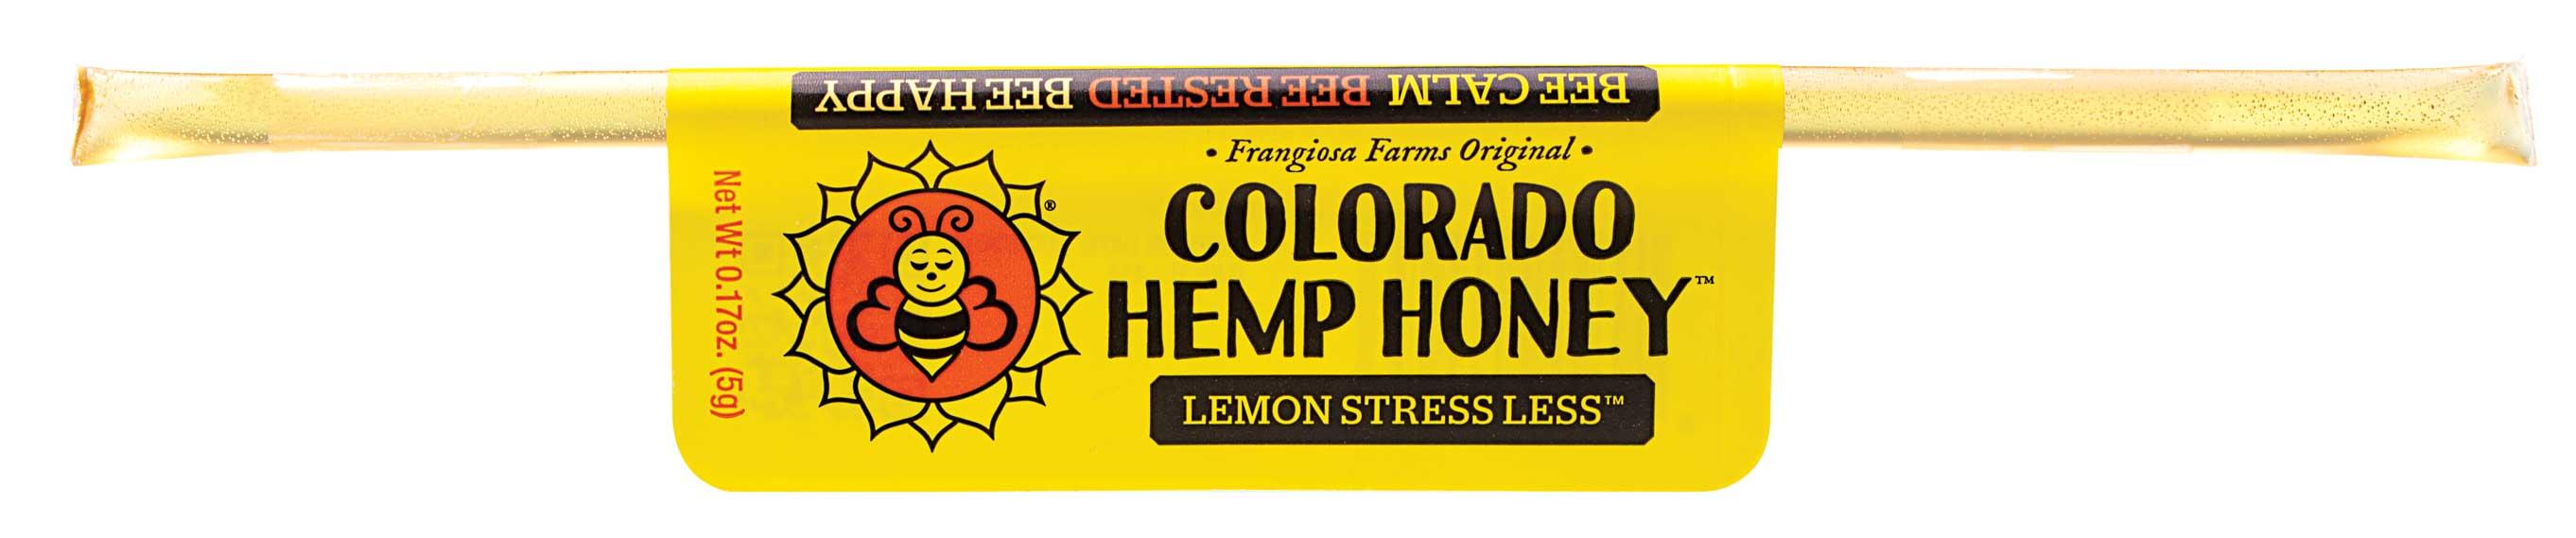 Colorado Honey Lemon Stress Less FS Extract Sticks Image